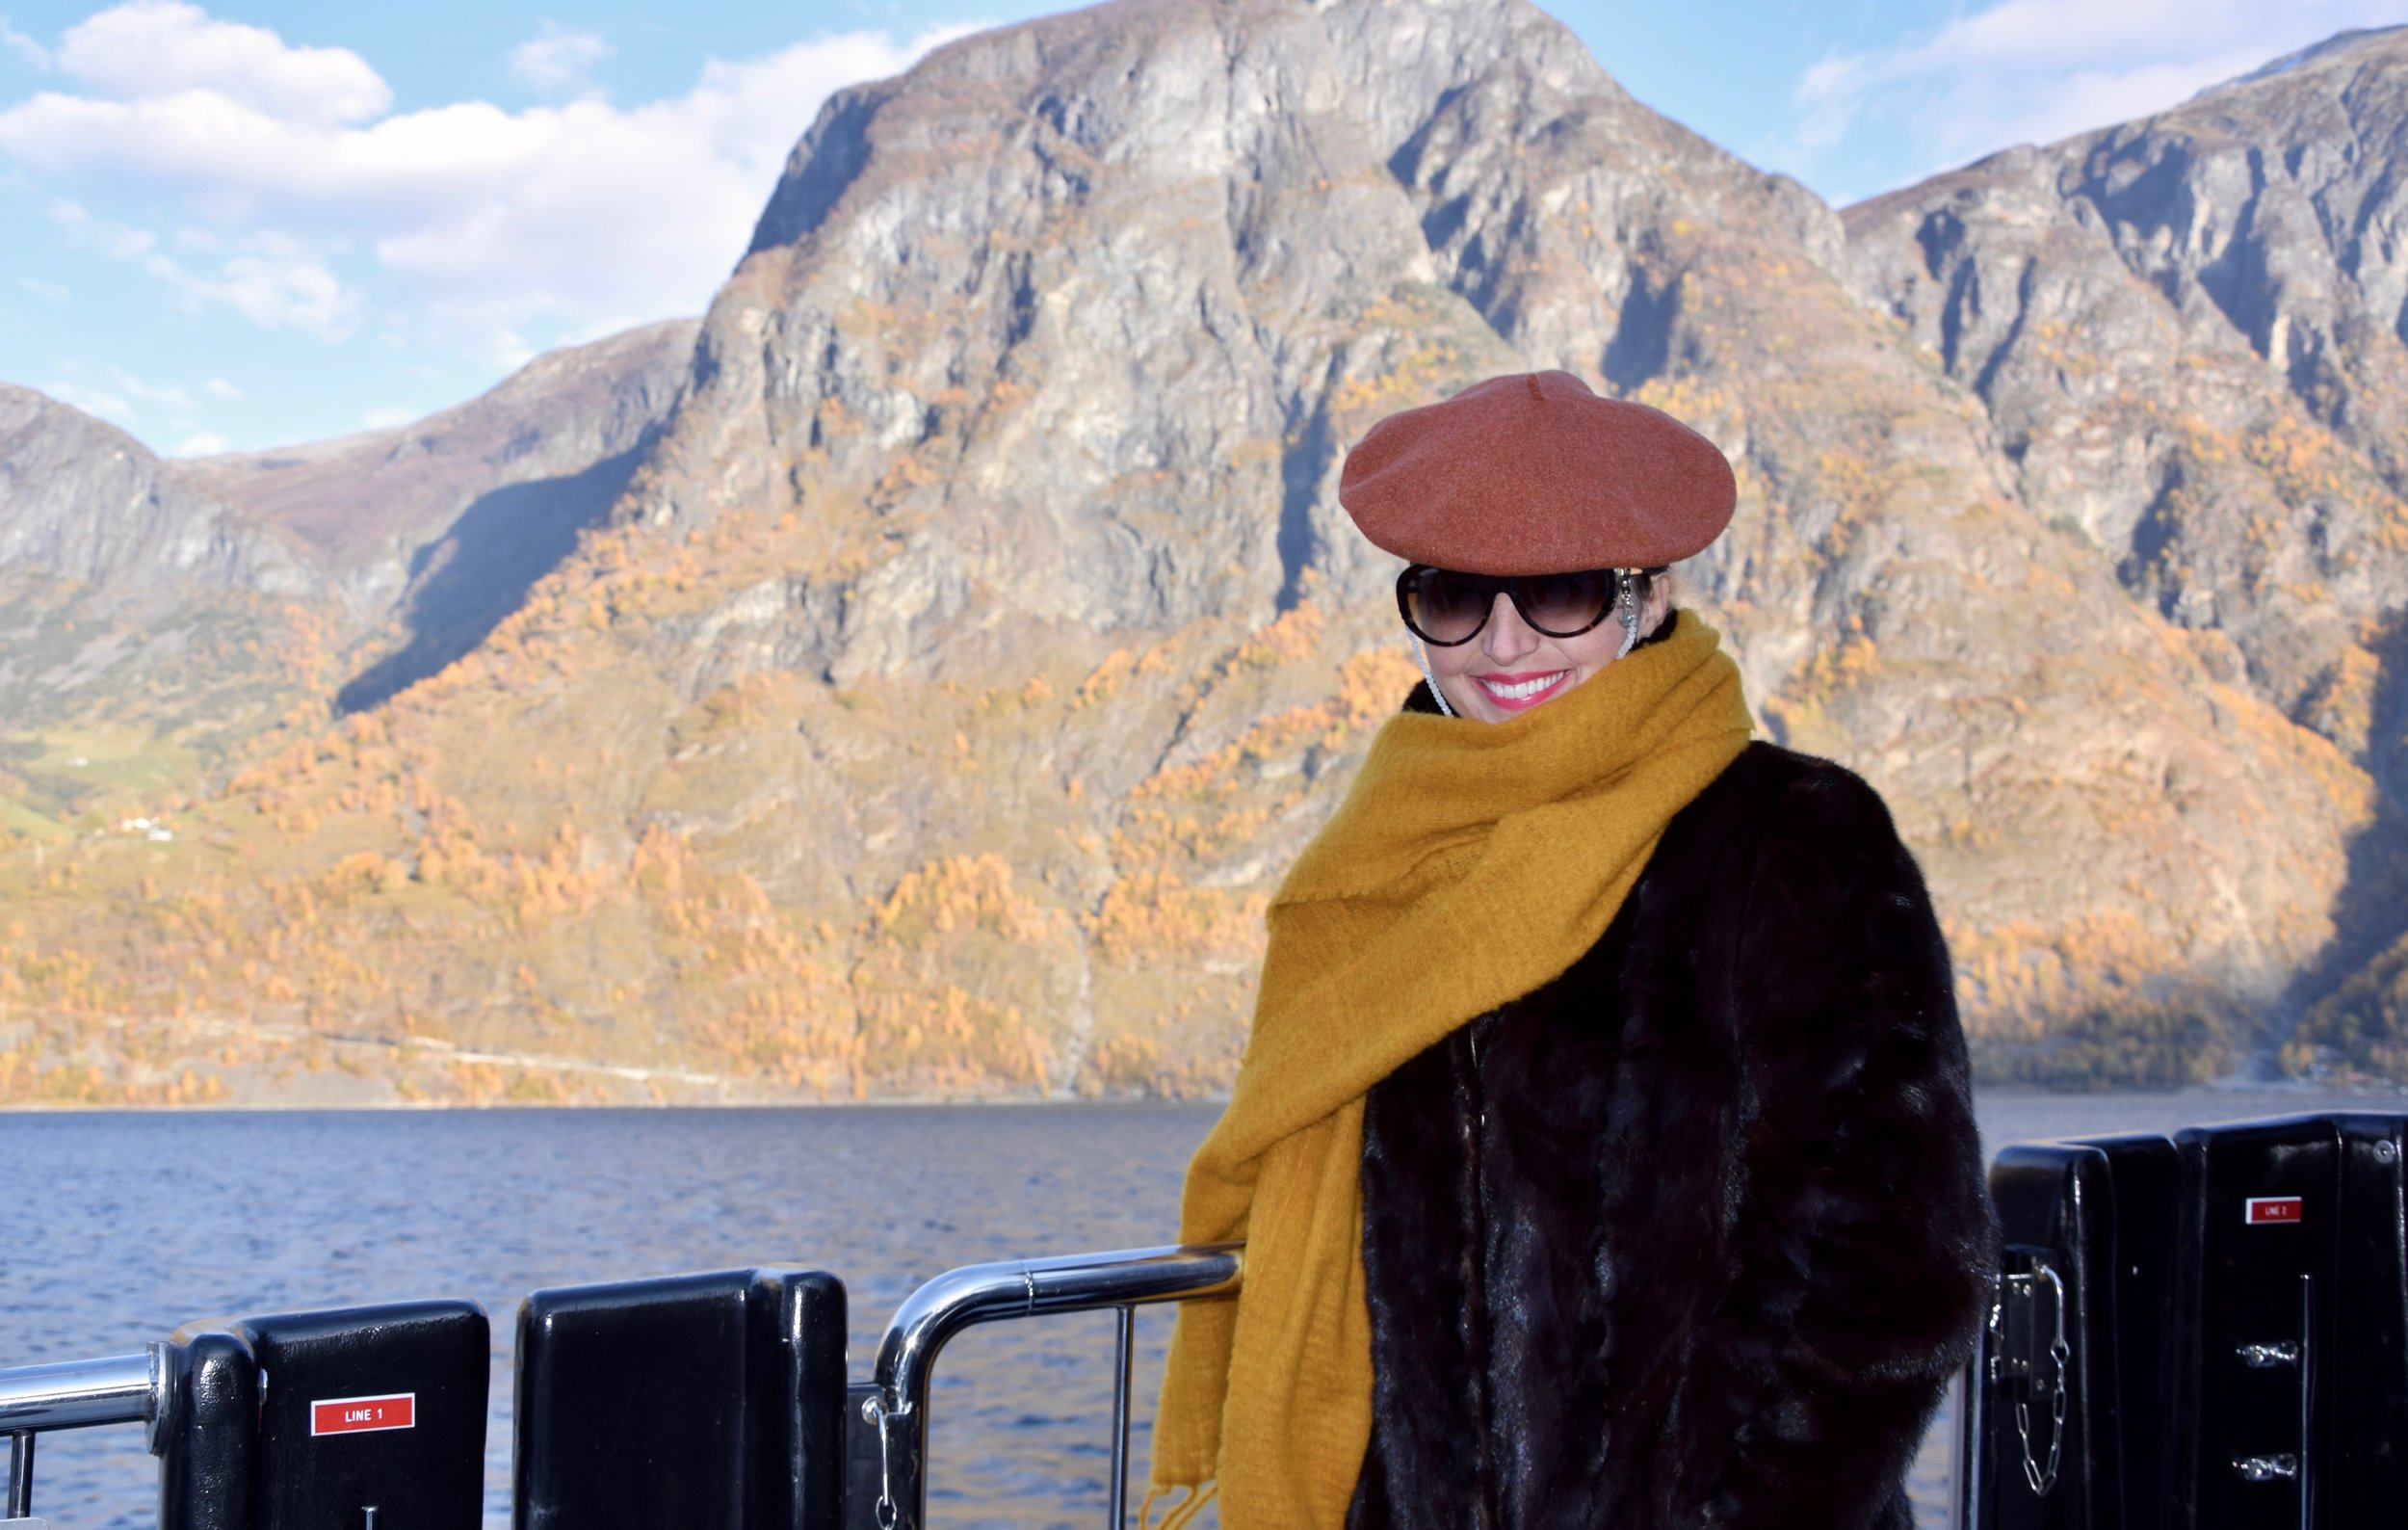 NORWAY IN A NUTSHELL -AURLANDSFJORD & NERØYFJORD PHOTOGRAPHER: DUSTIN STENSLAND PHOTOGRAPHER: JON LUSKIN